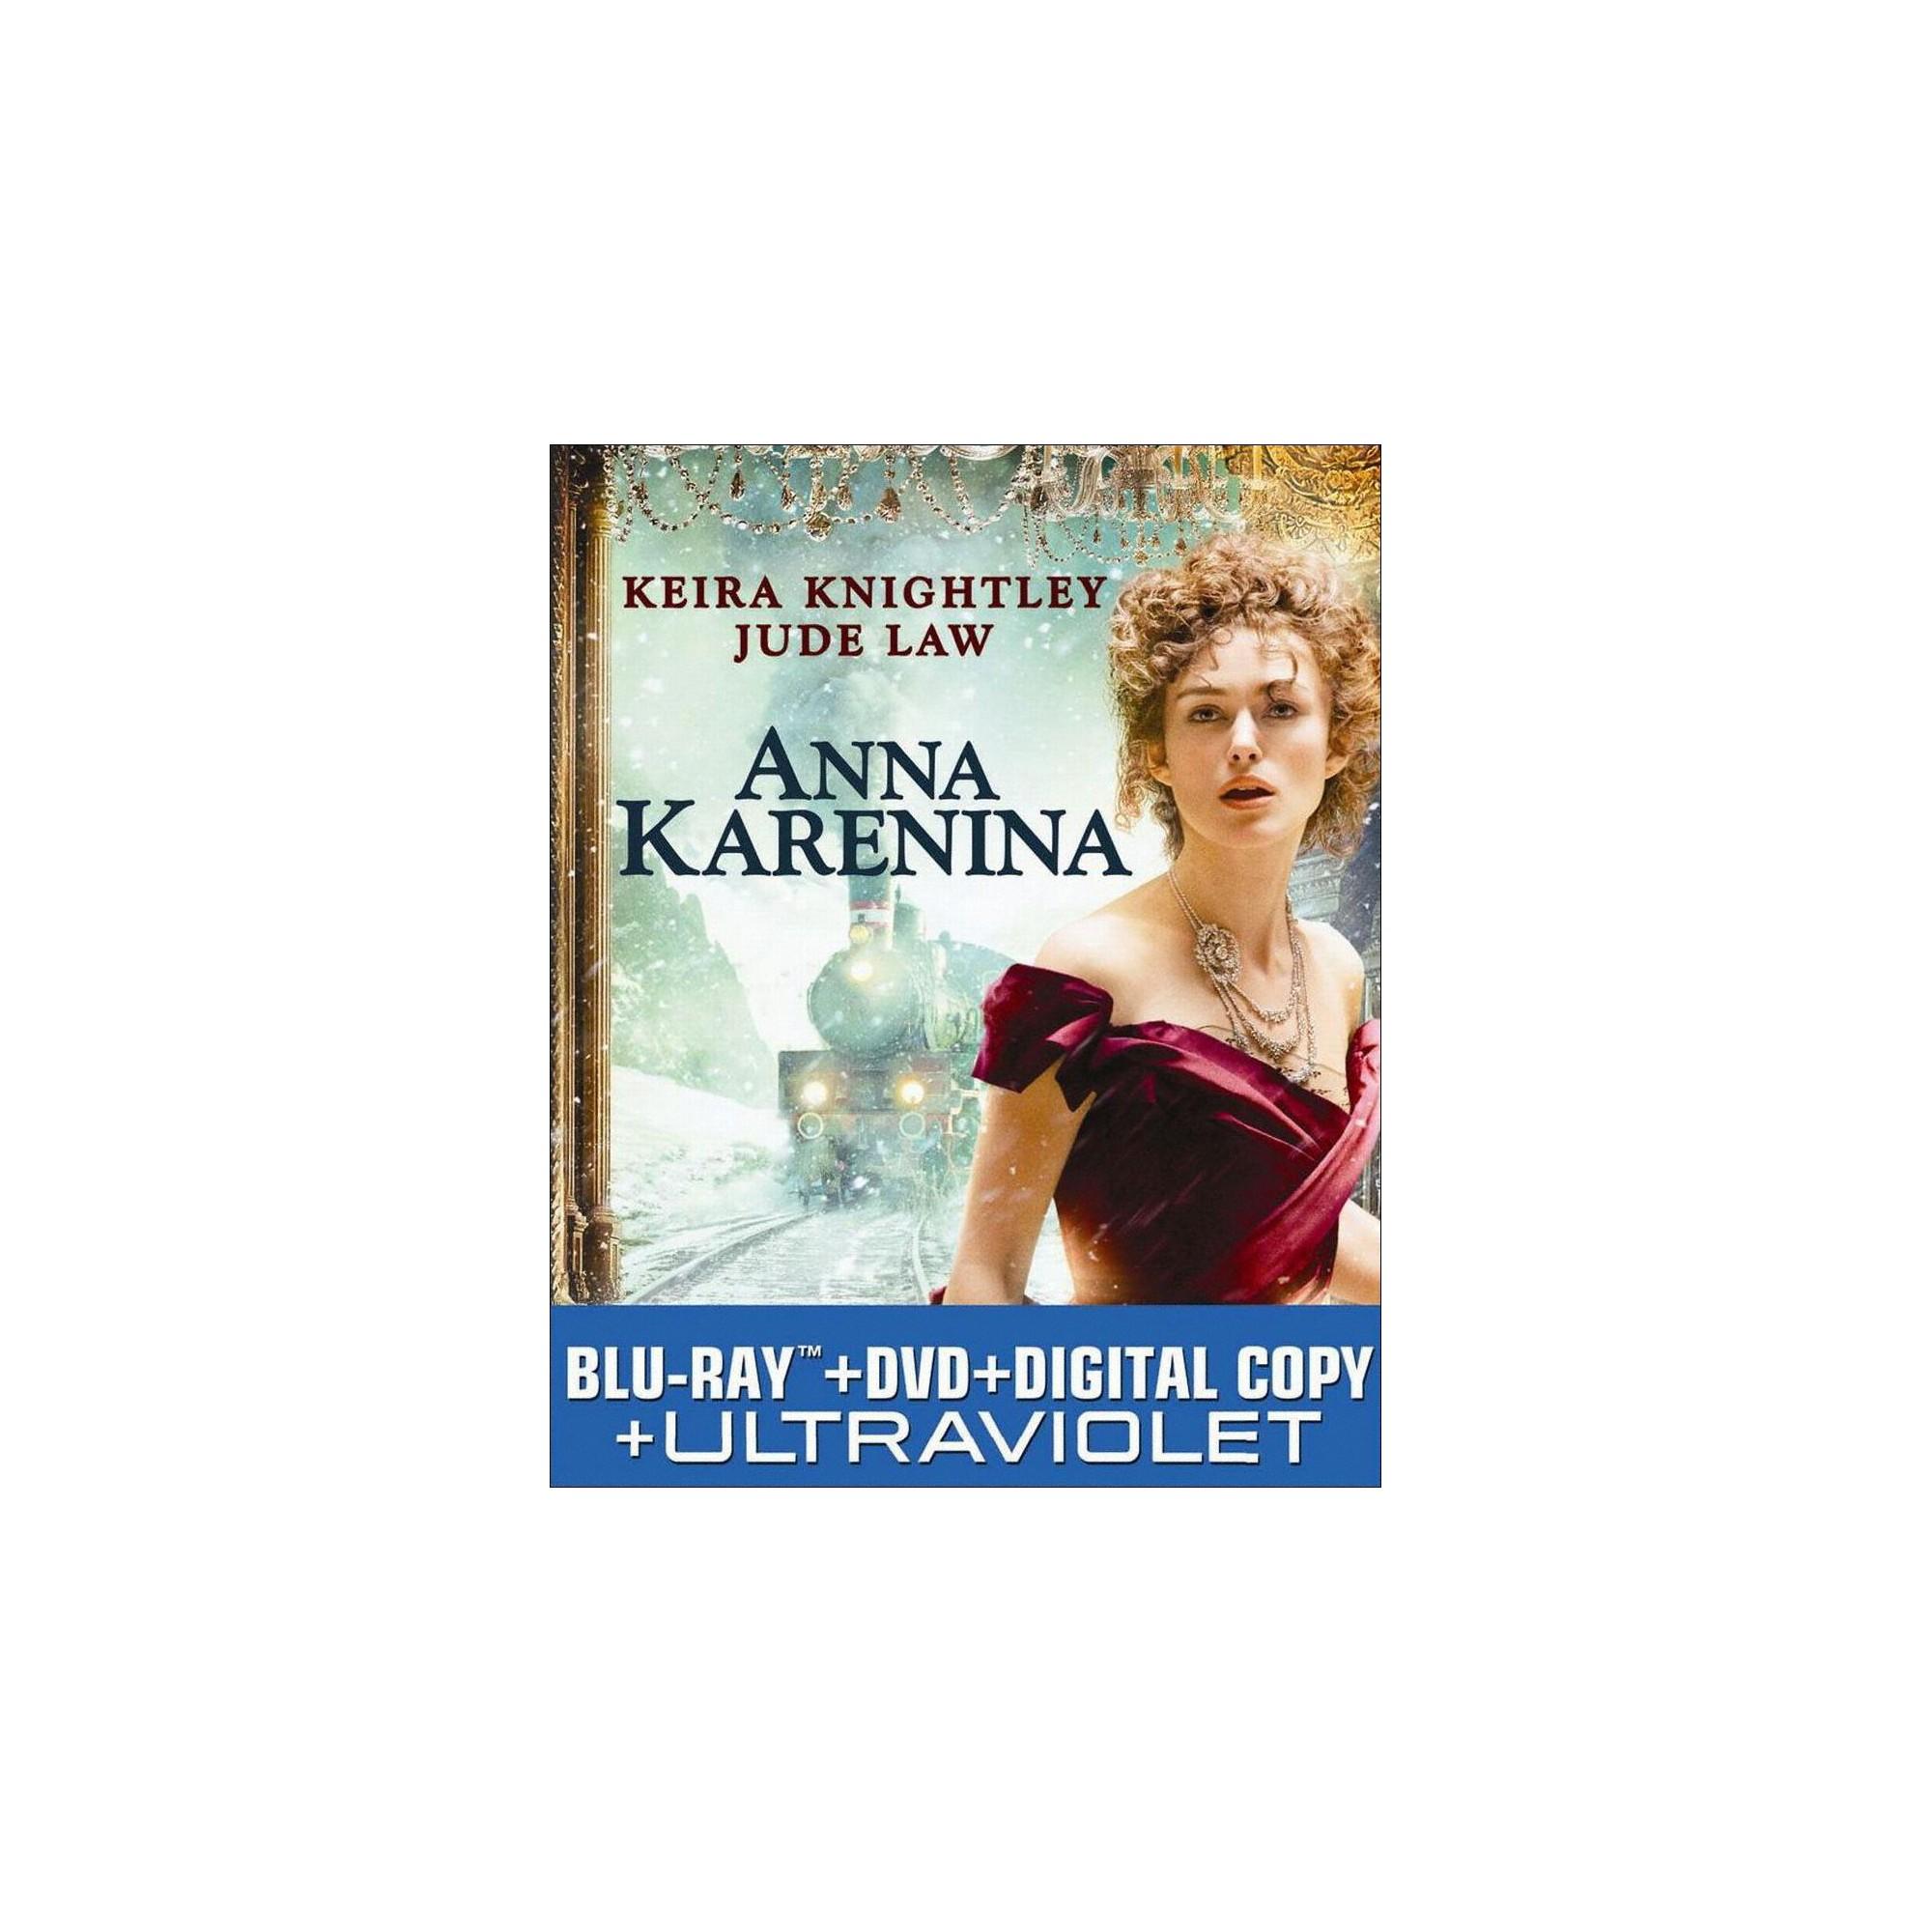 Anna Karenina (2 Discs) (Includes Digital Copy) (UltraViolet) (Blu-ray/Dvd)